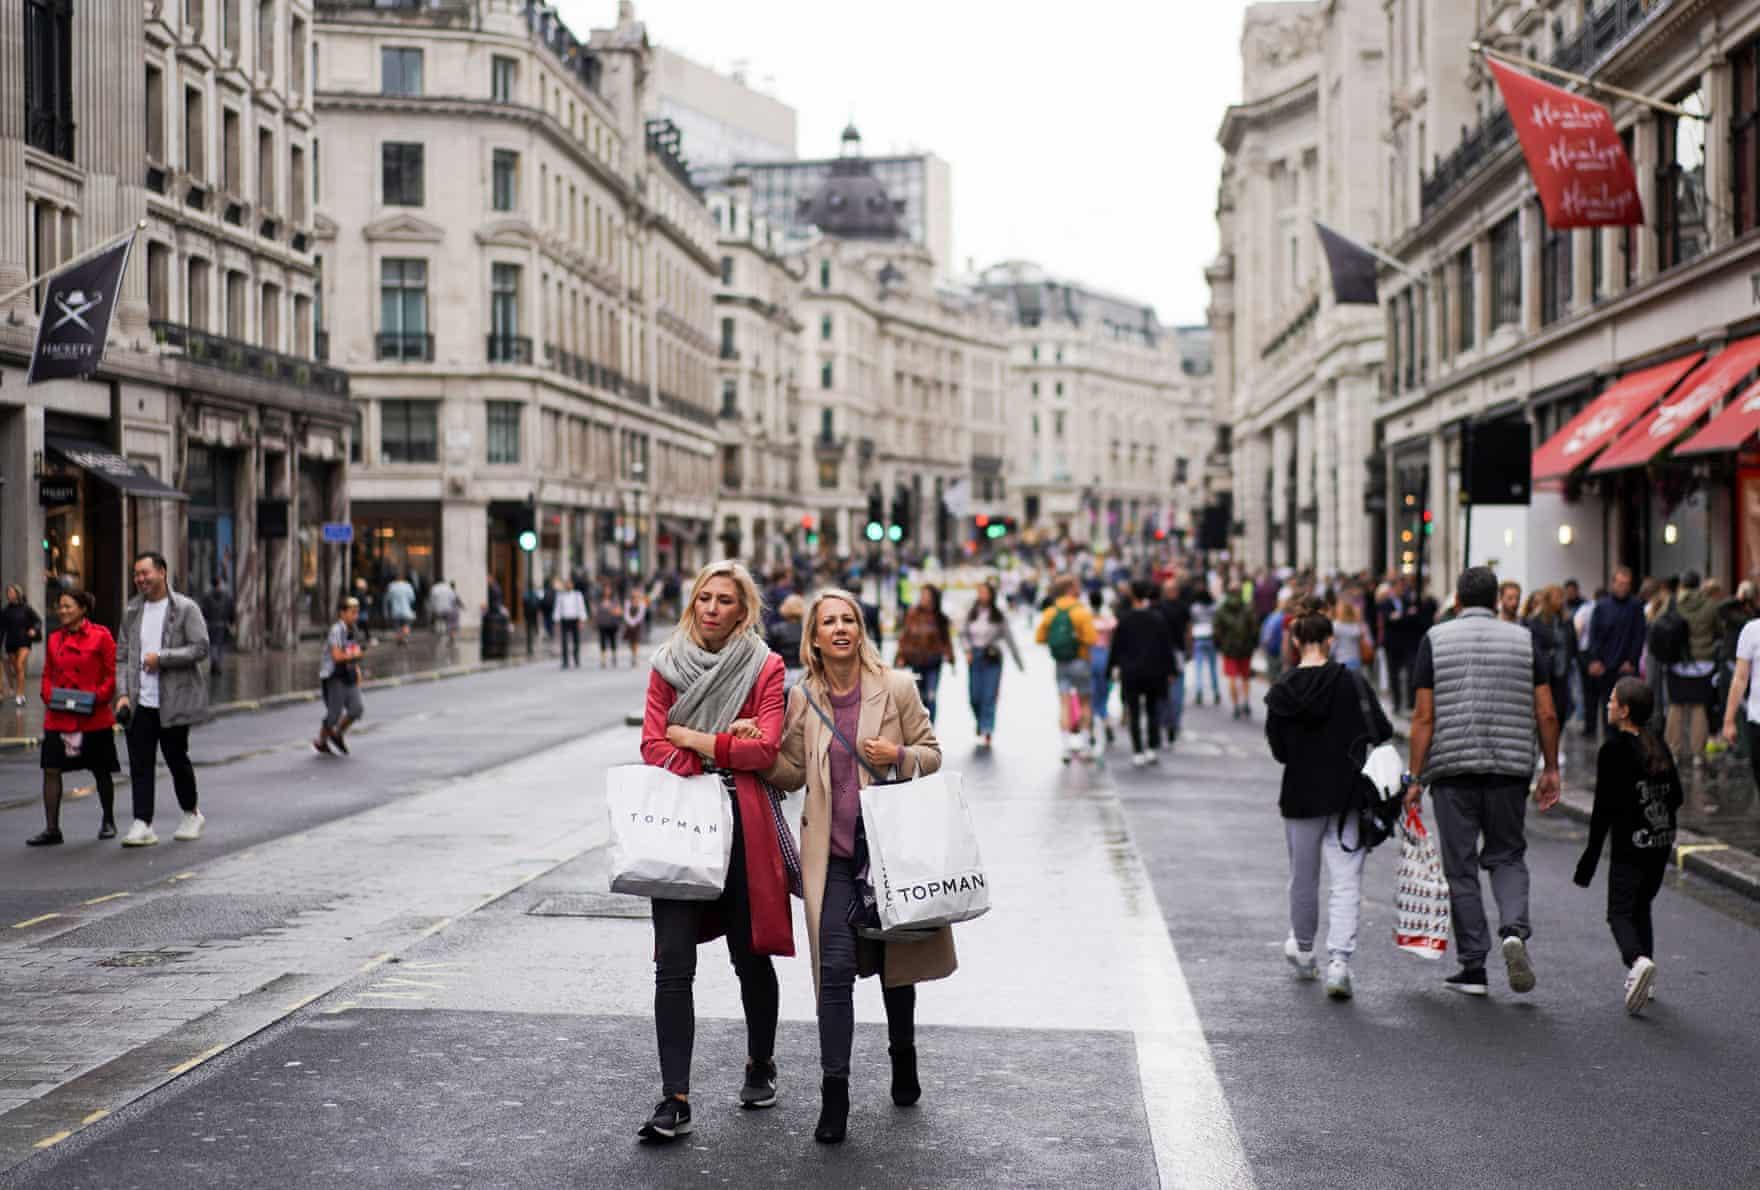 London's Regent Street on car free day 2019 (photo credit  theguardian.com.uk )